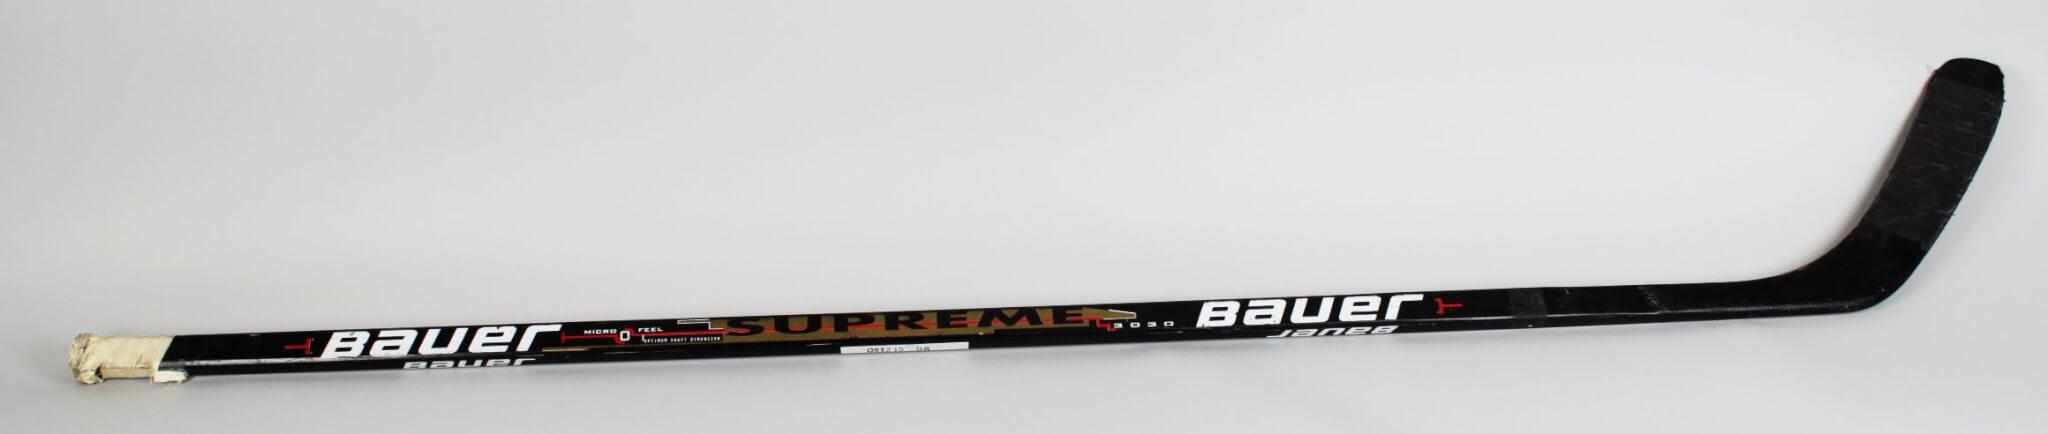 Darryl Sydor Game-Used Hockey Stick Kings - COA